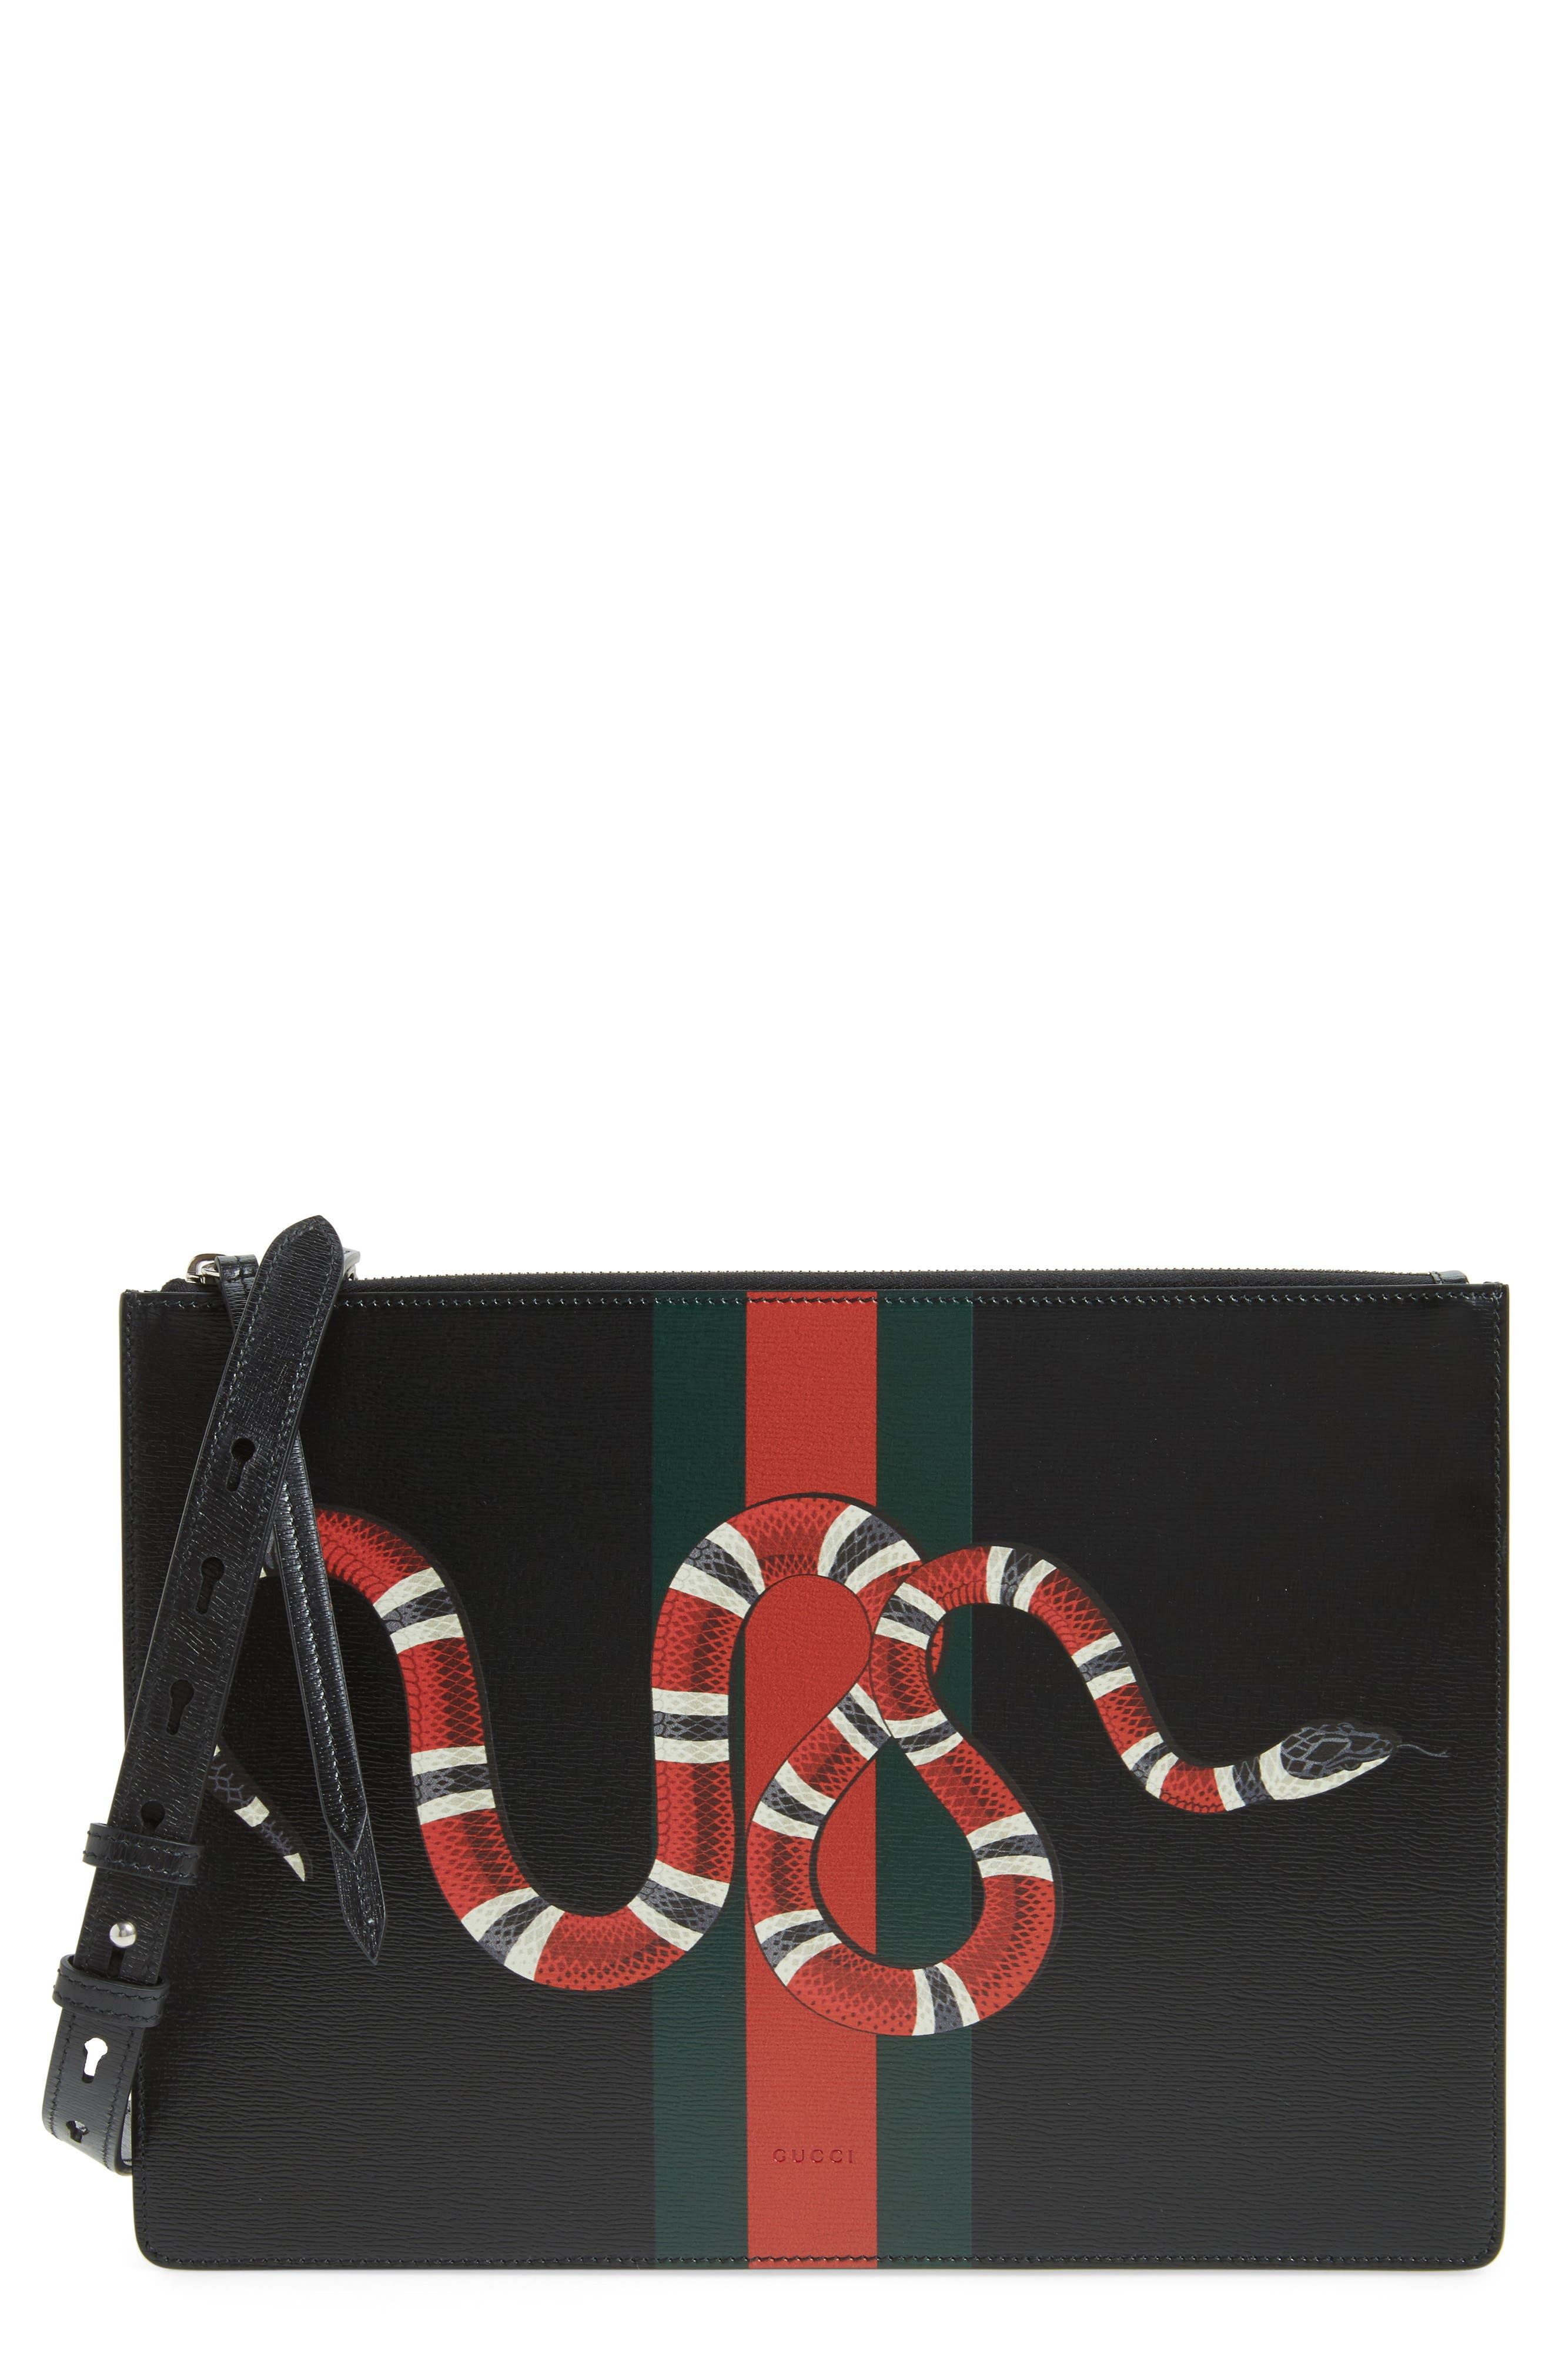 Gucci Snake Band Leather Messenger Bag